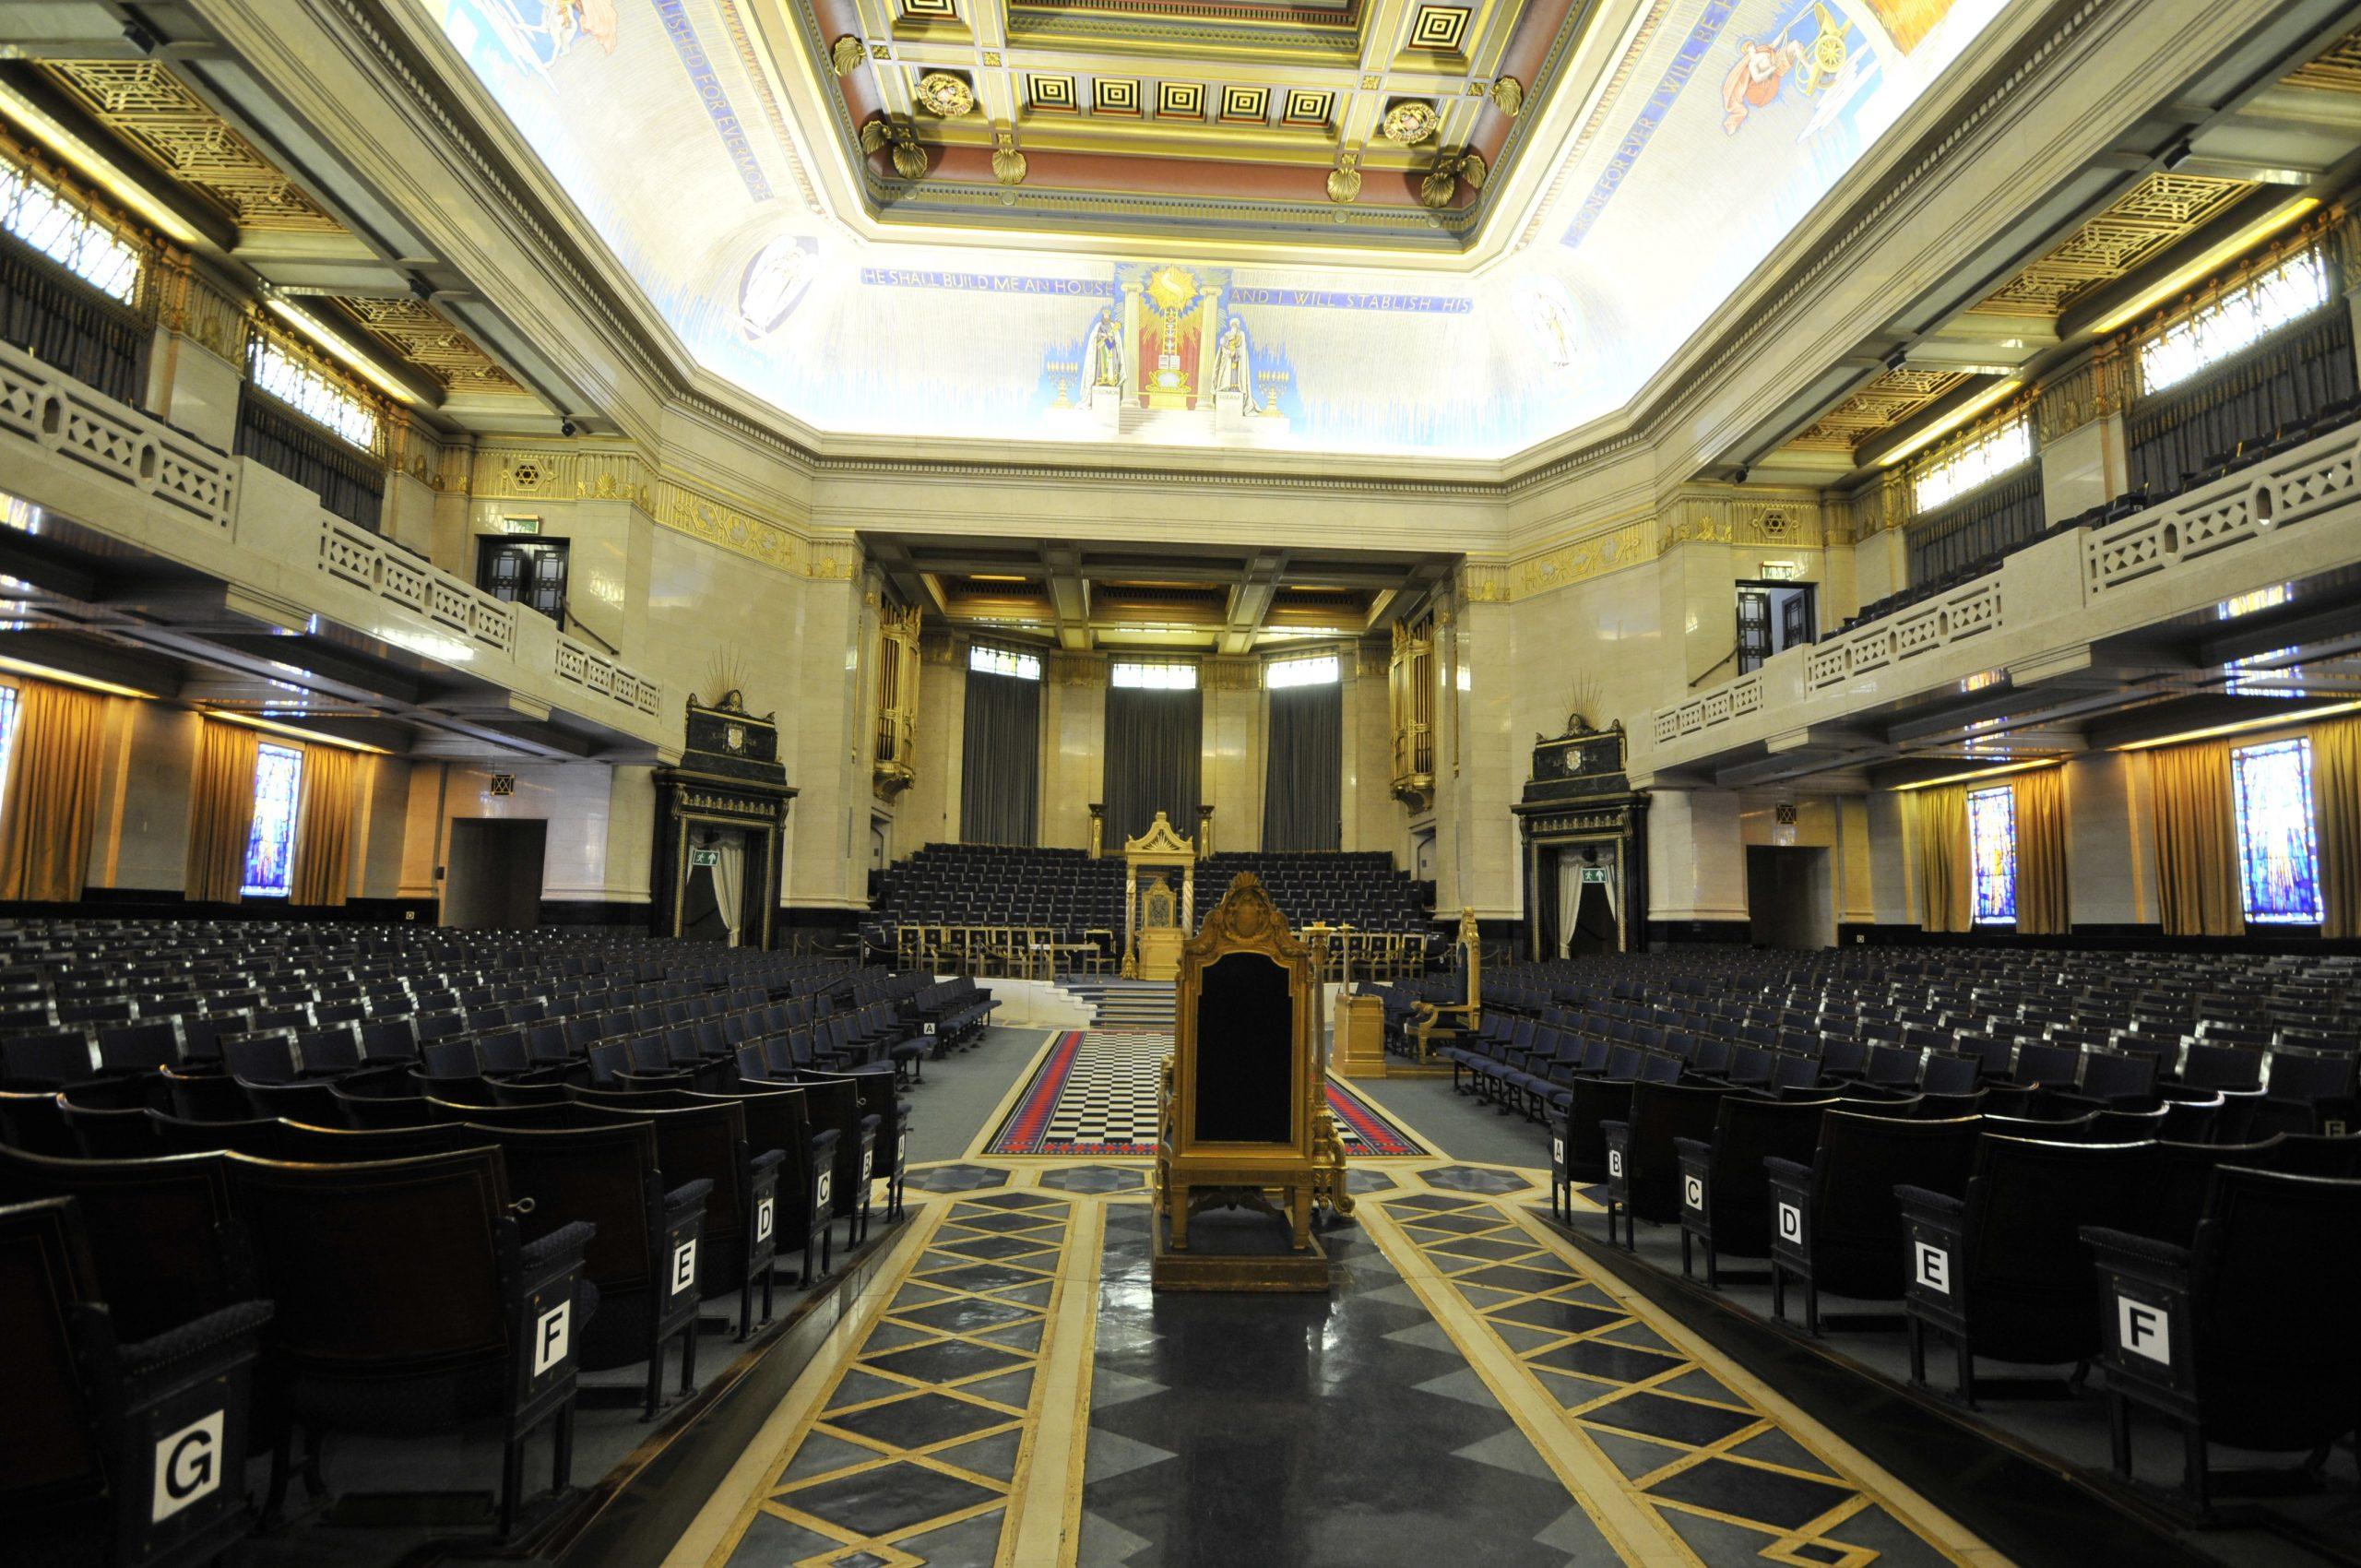 Grand Temple Freemasons' Hall